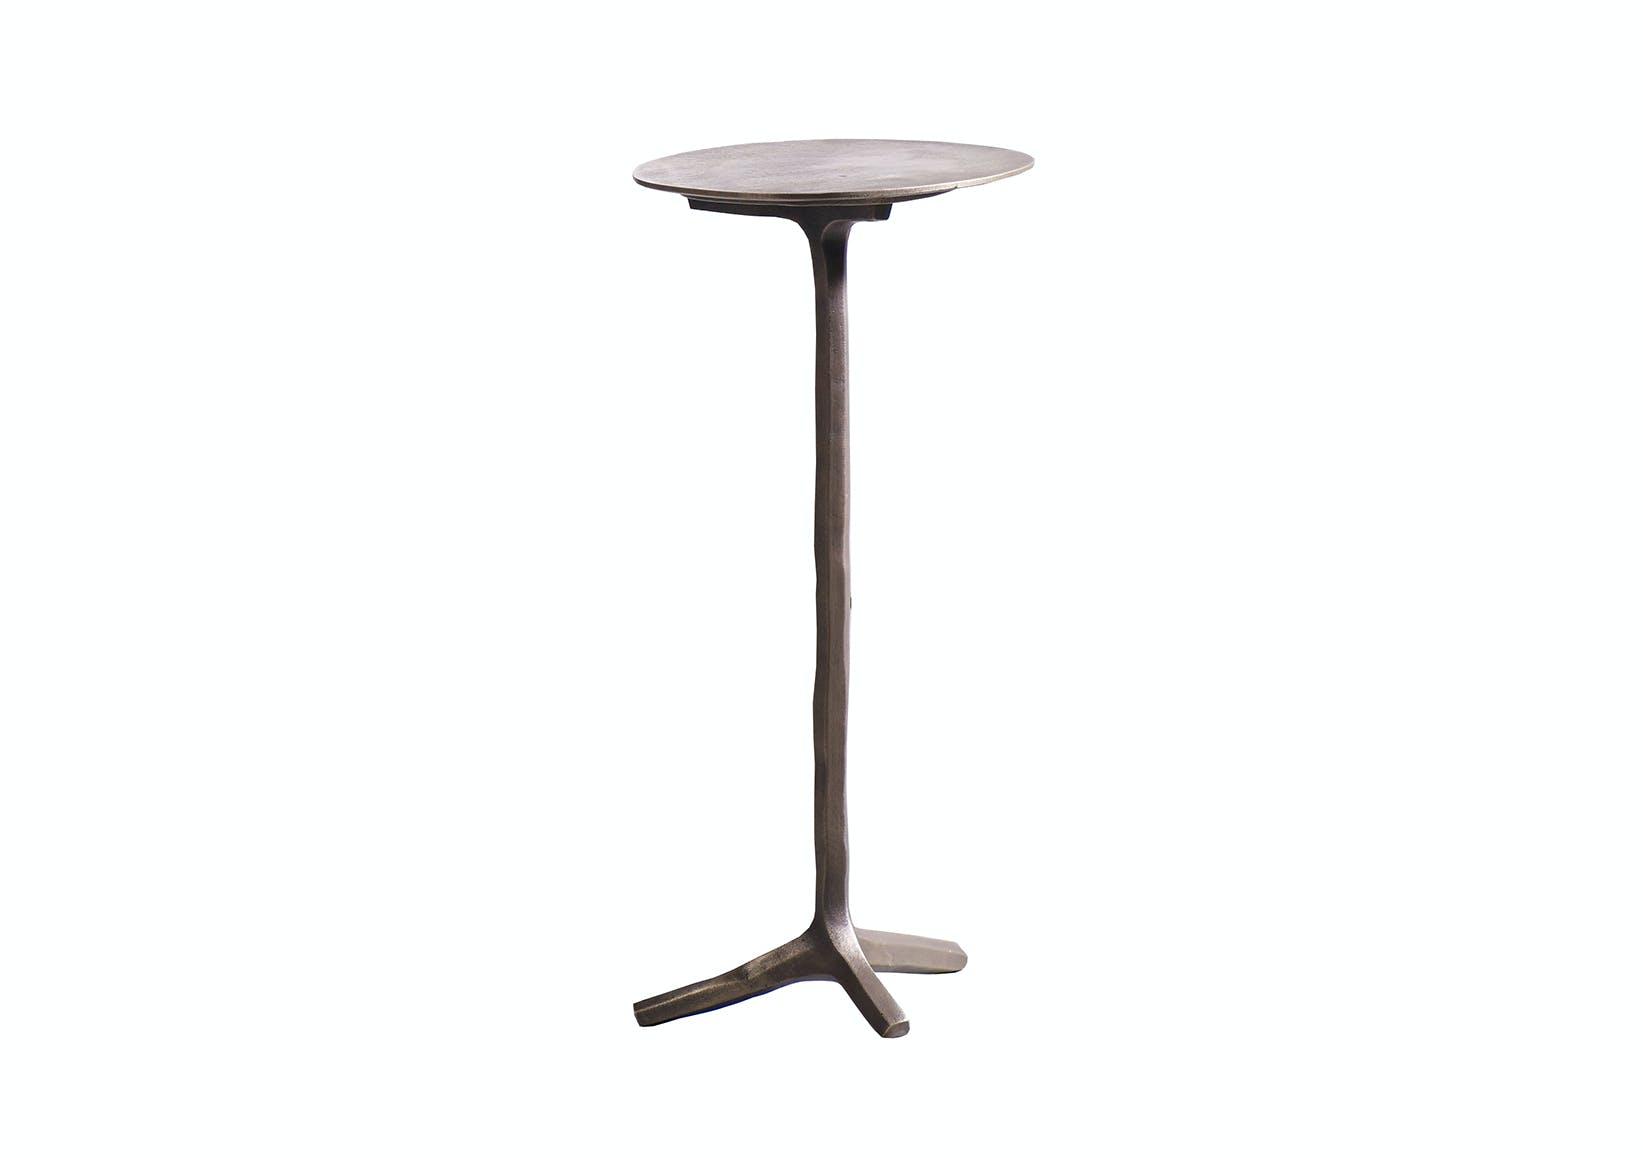 Klink Table Piet Boon 2 Hl